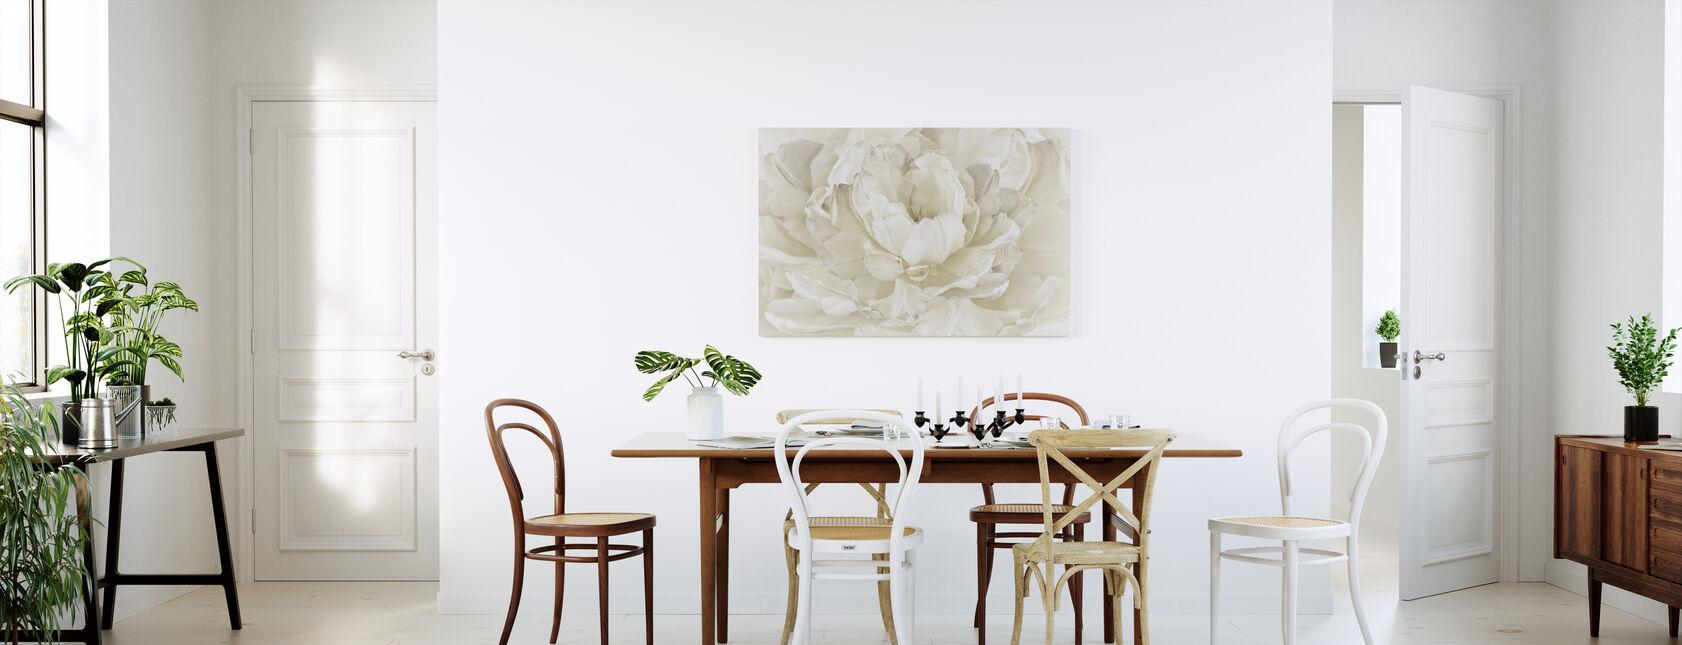 Ivory White Double Tulip - Canvas print - Kitchen